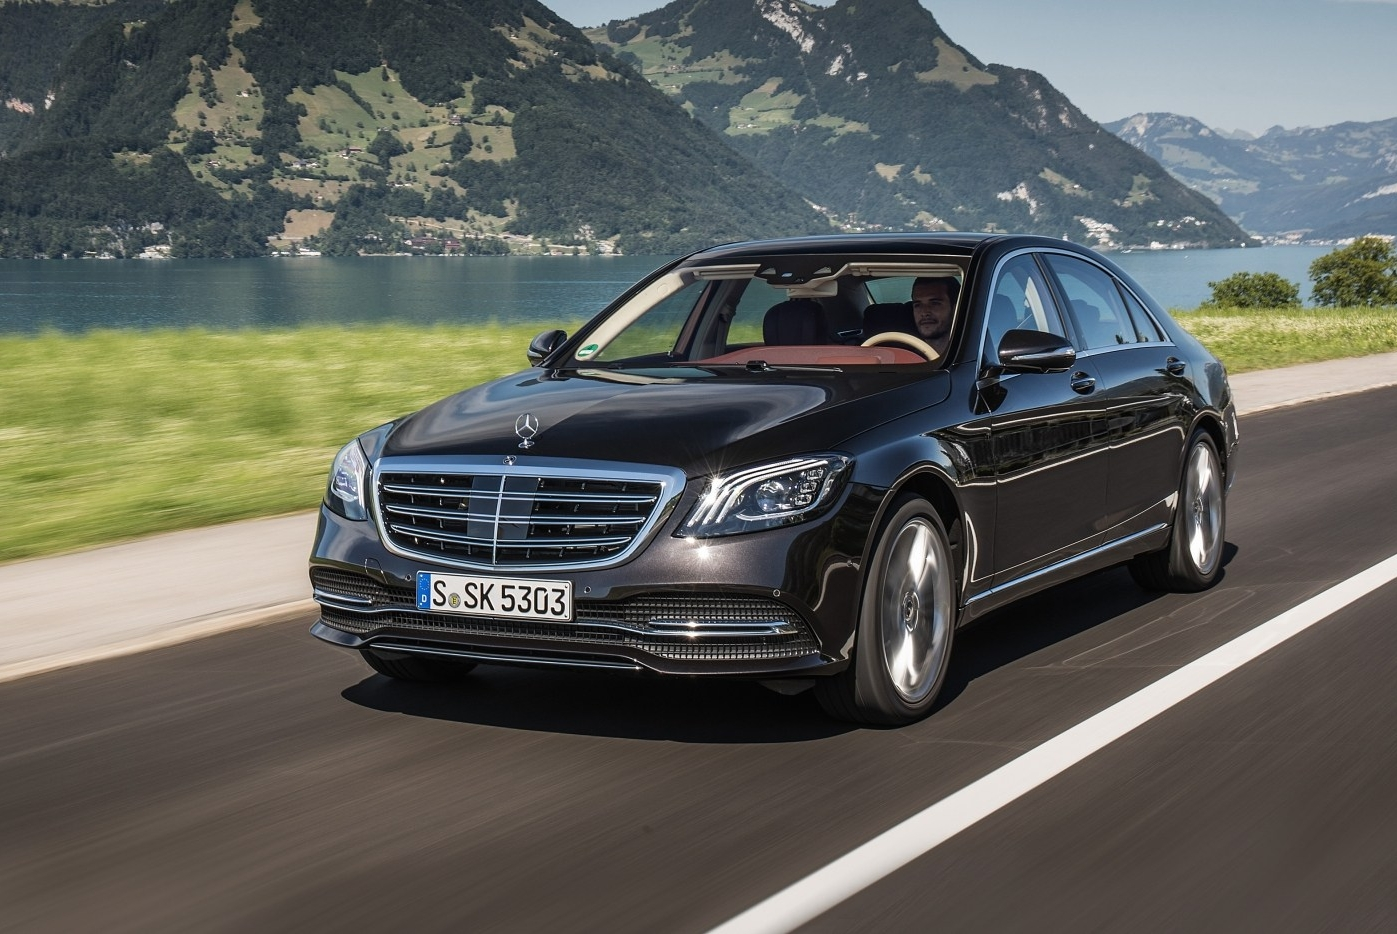 Mercedes S-Class (W222) - цены, отзывы, характеристики S-Class (W222) от  Mercedes